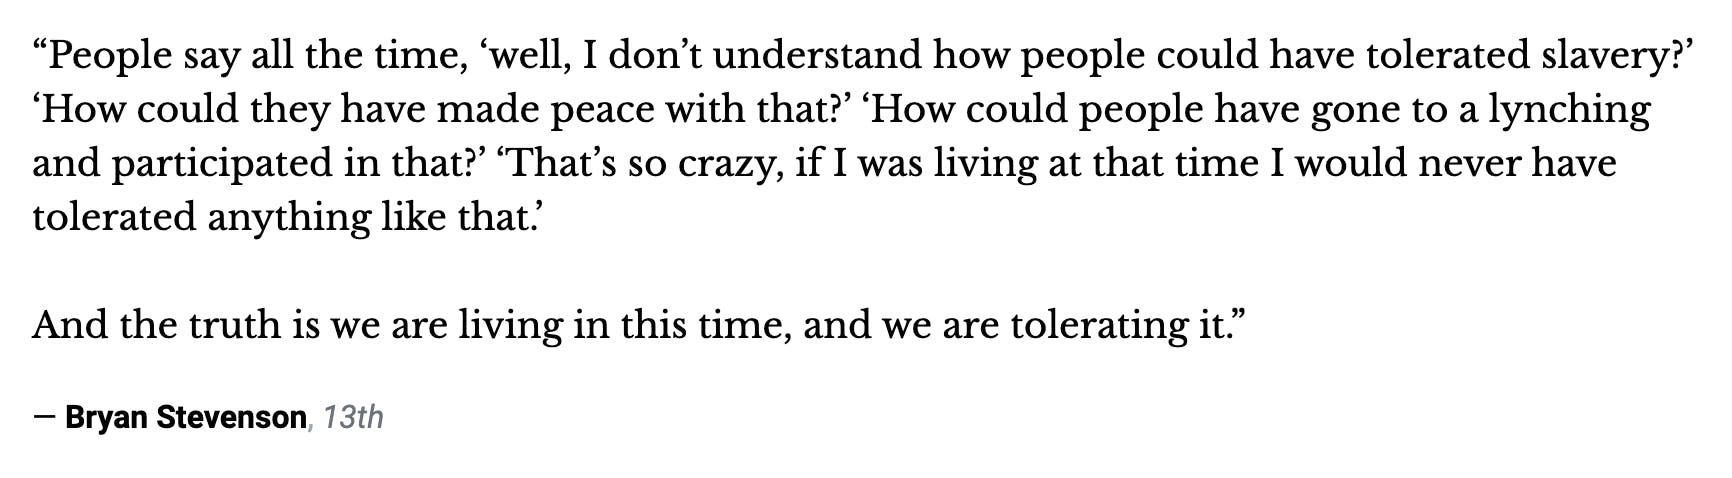 We're tolerating it, Bryan Stevenson